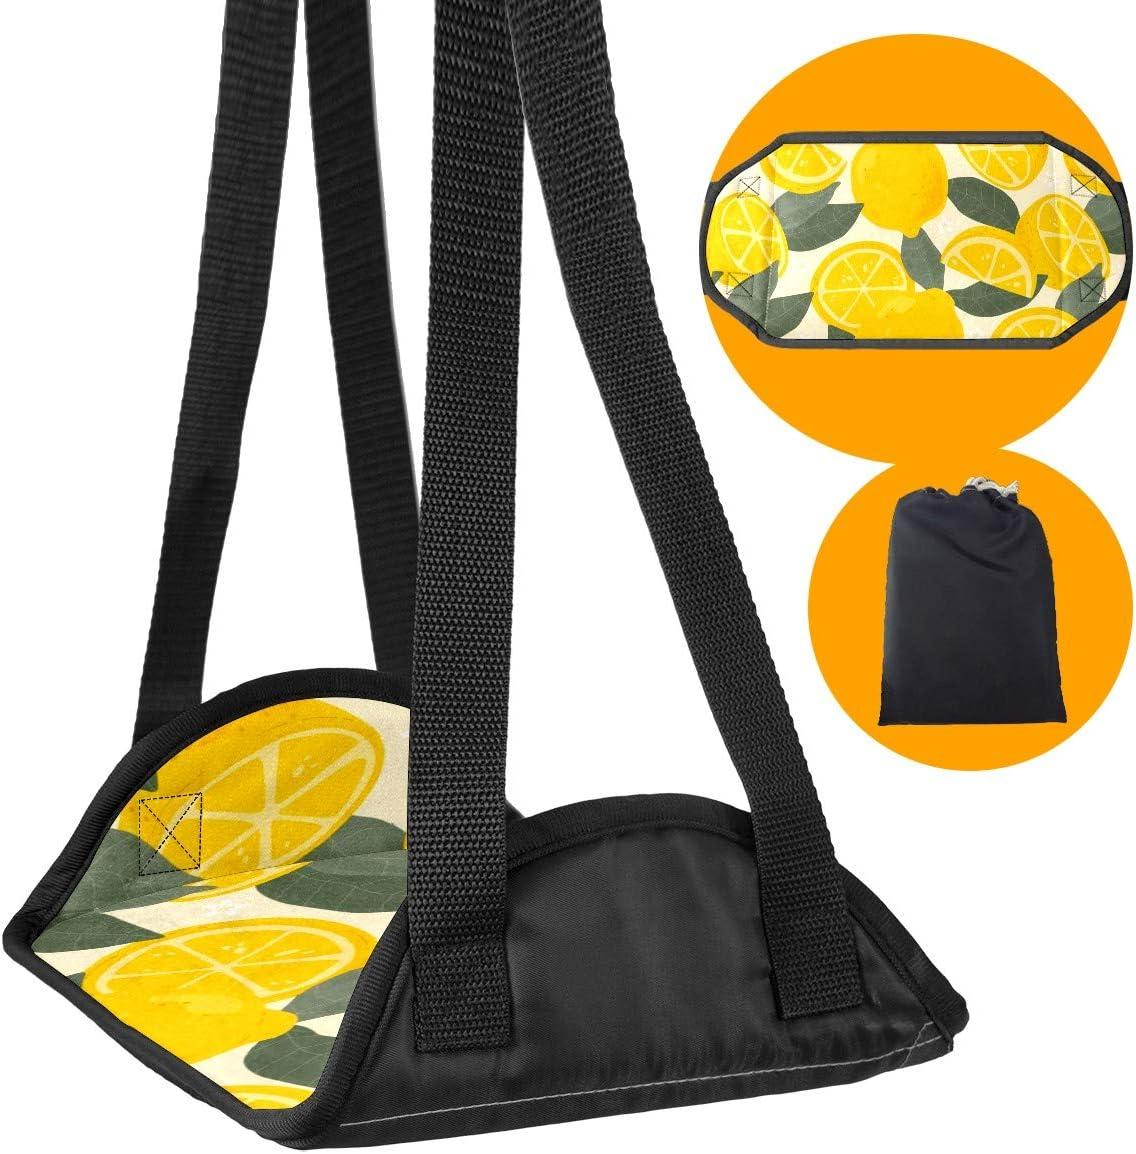 Foot Hammock Desk Footrest Department store Adjustable Comfy Portable Hanger Max 67% OFF